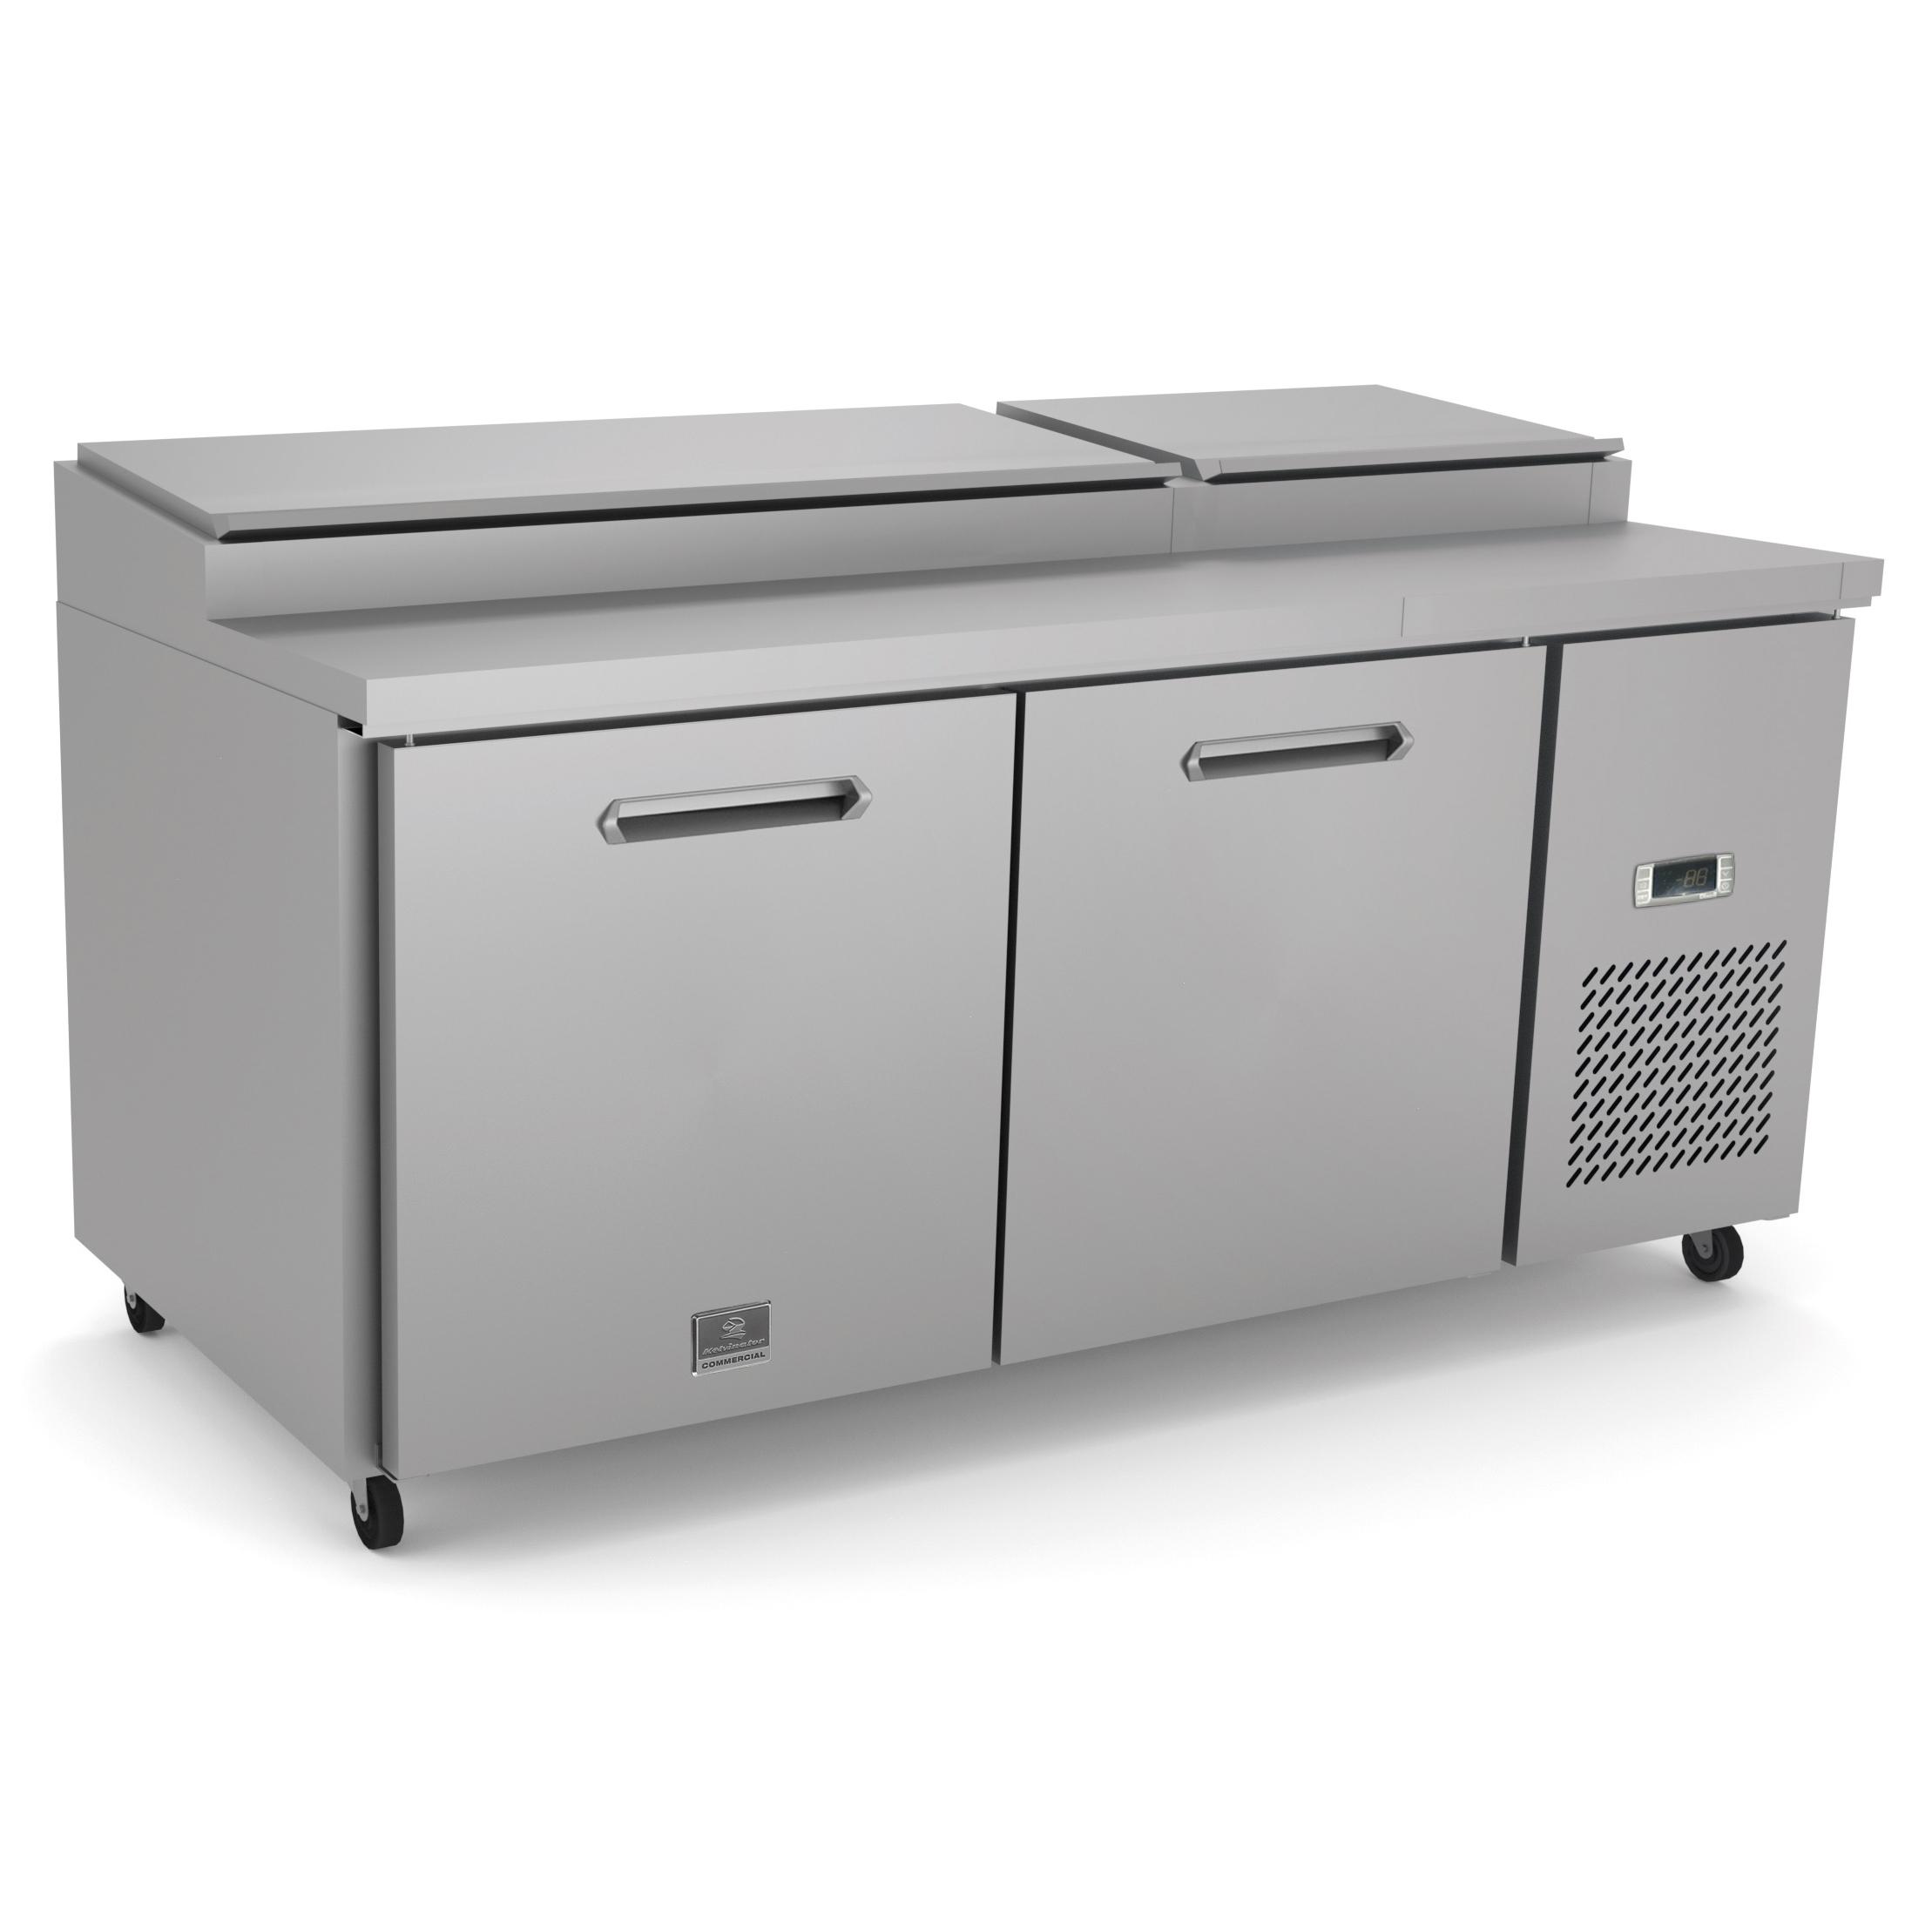 Kelvinator Commercial KCHPT72.9 refrigerated counter, pizza prep table